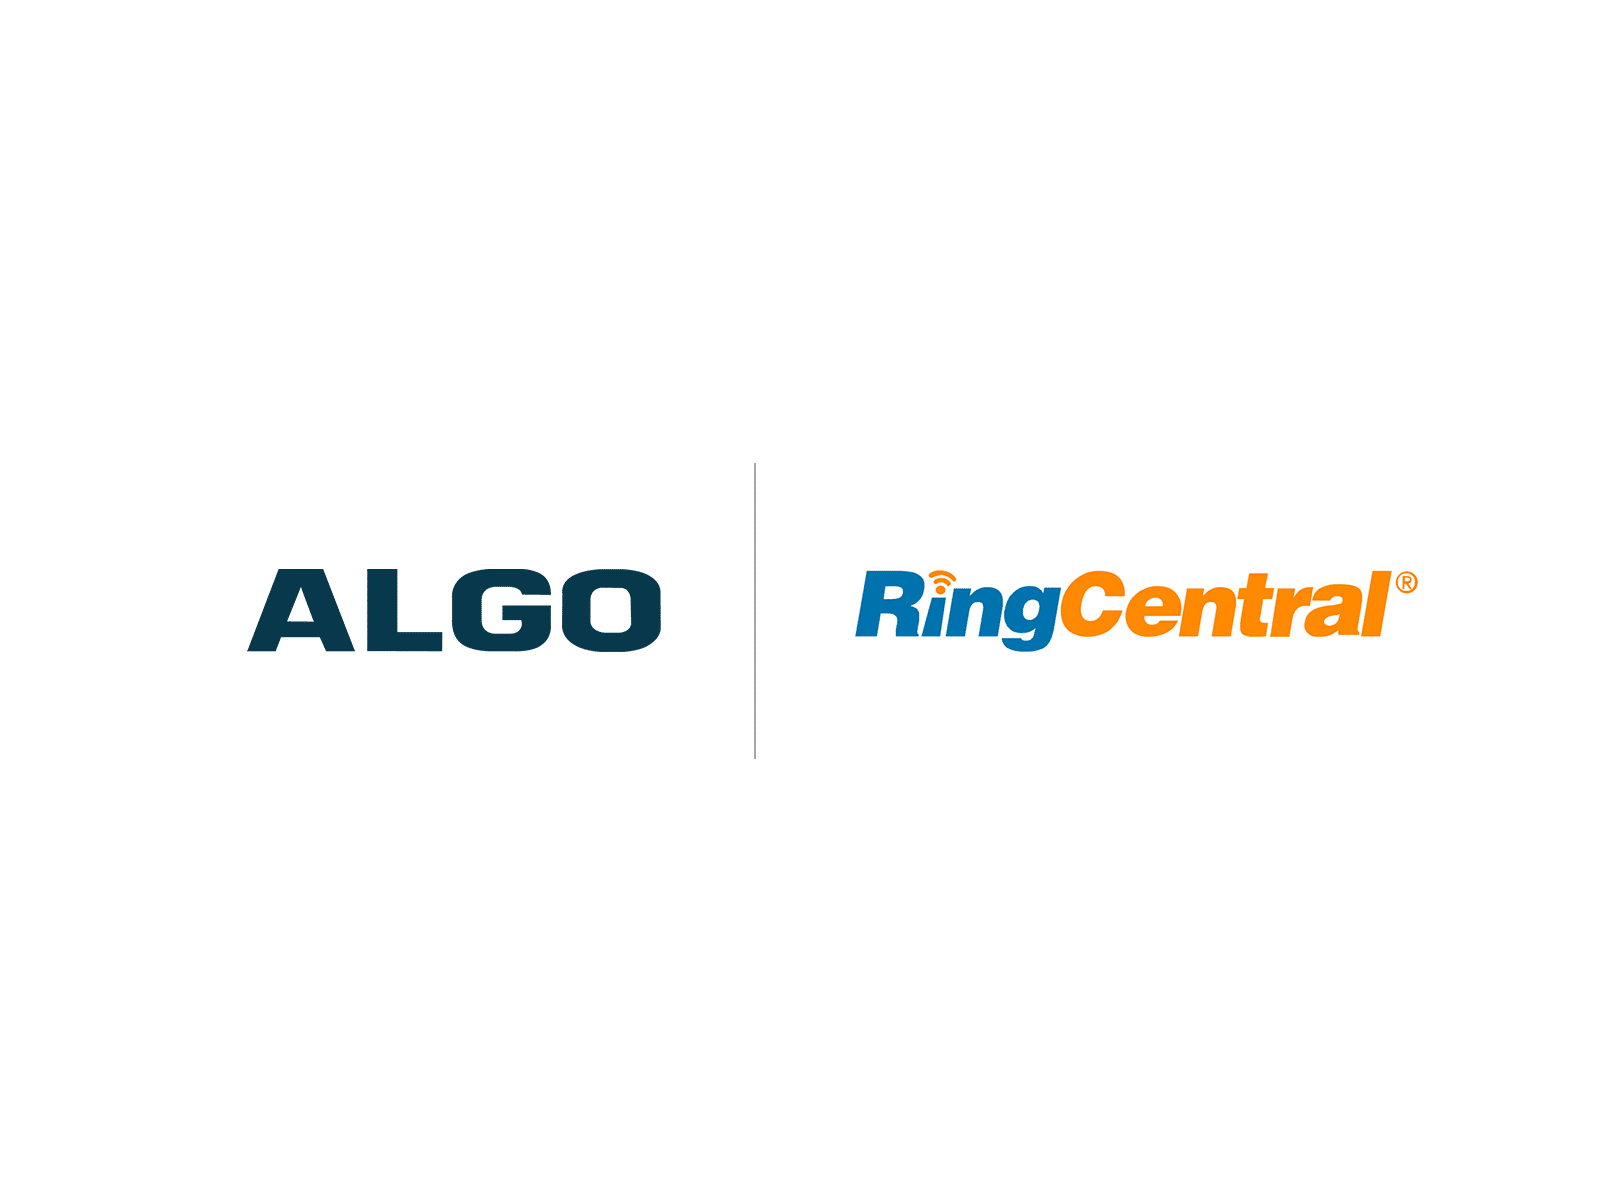 Algo Ring Central Compatibility